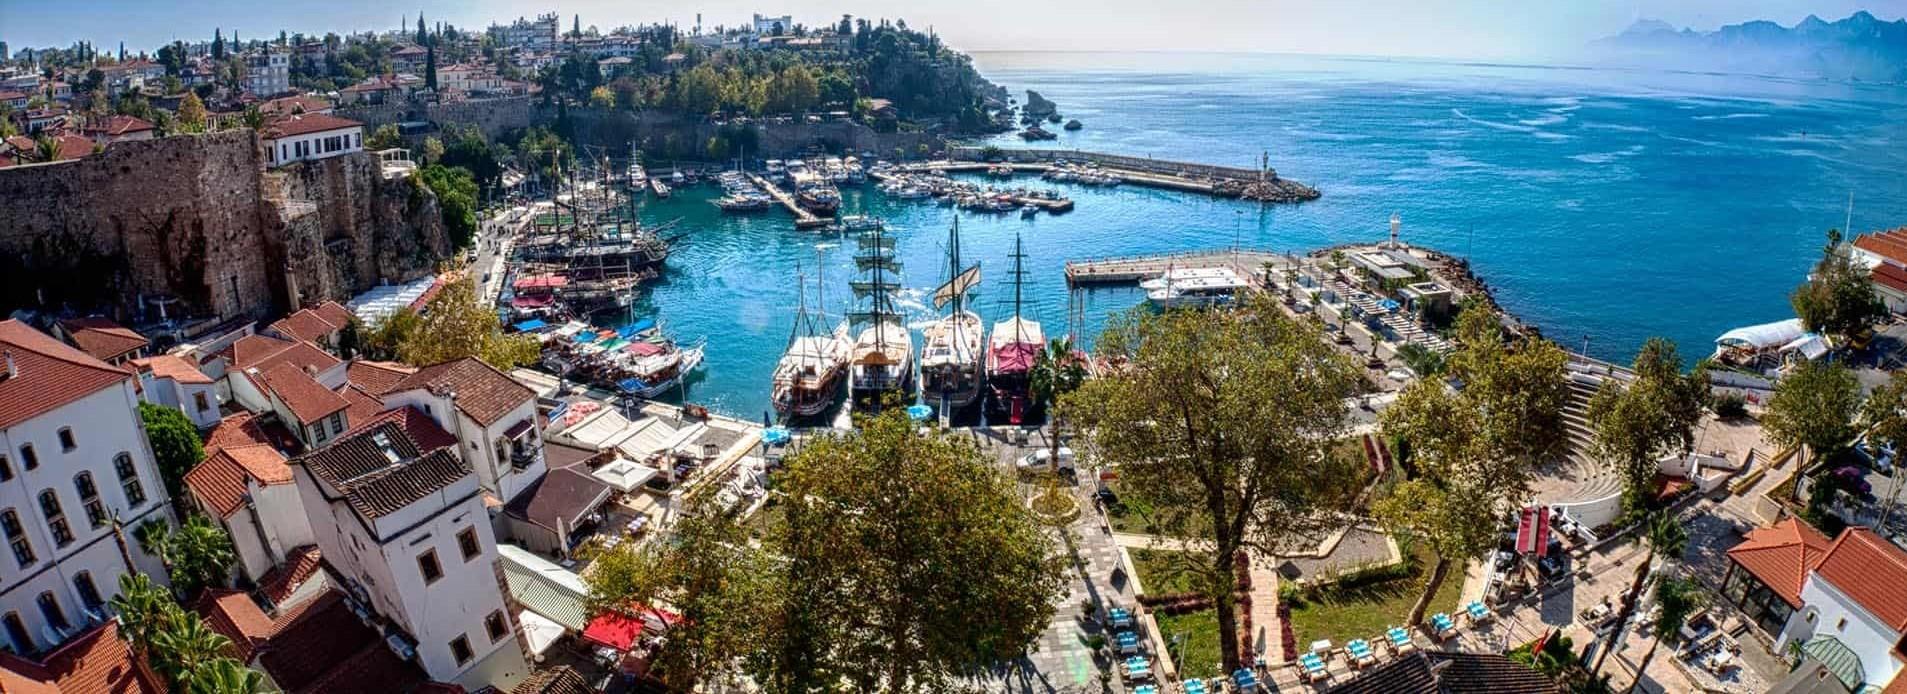 Travel Guide Antalya